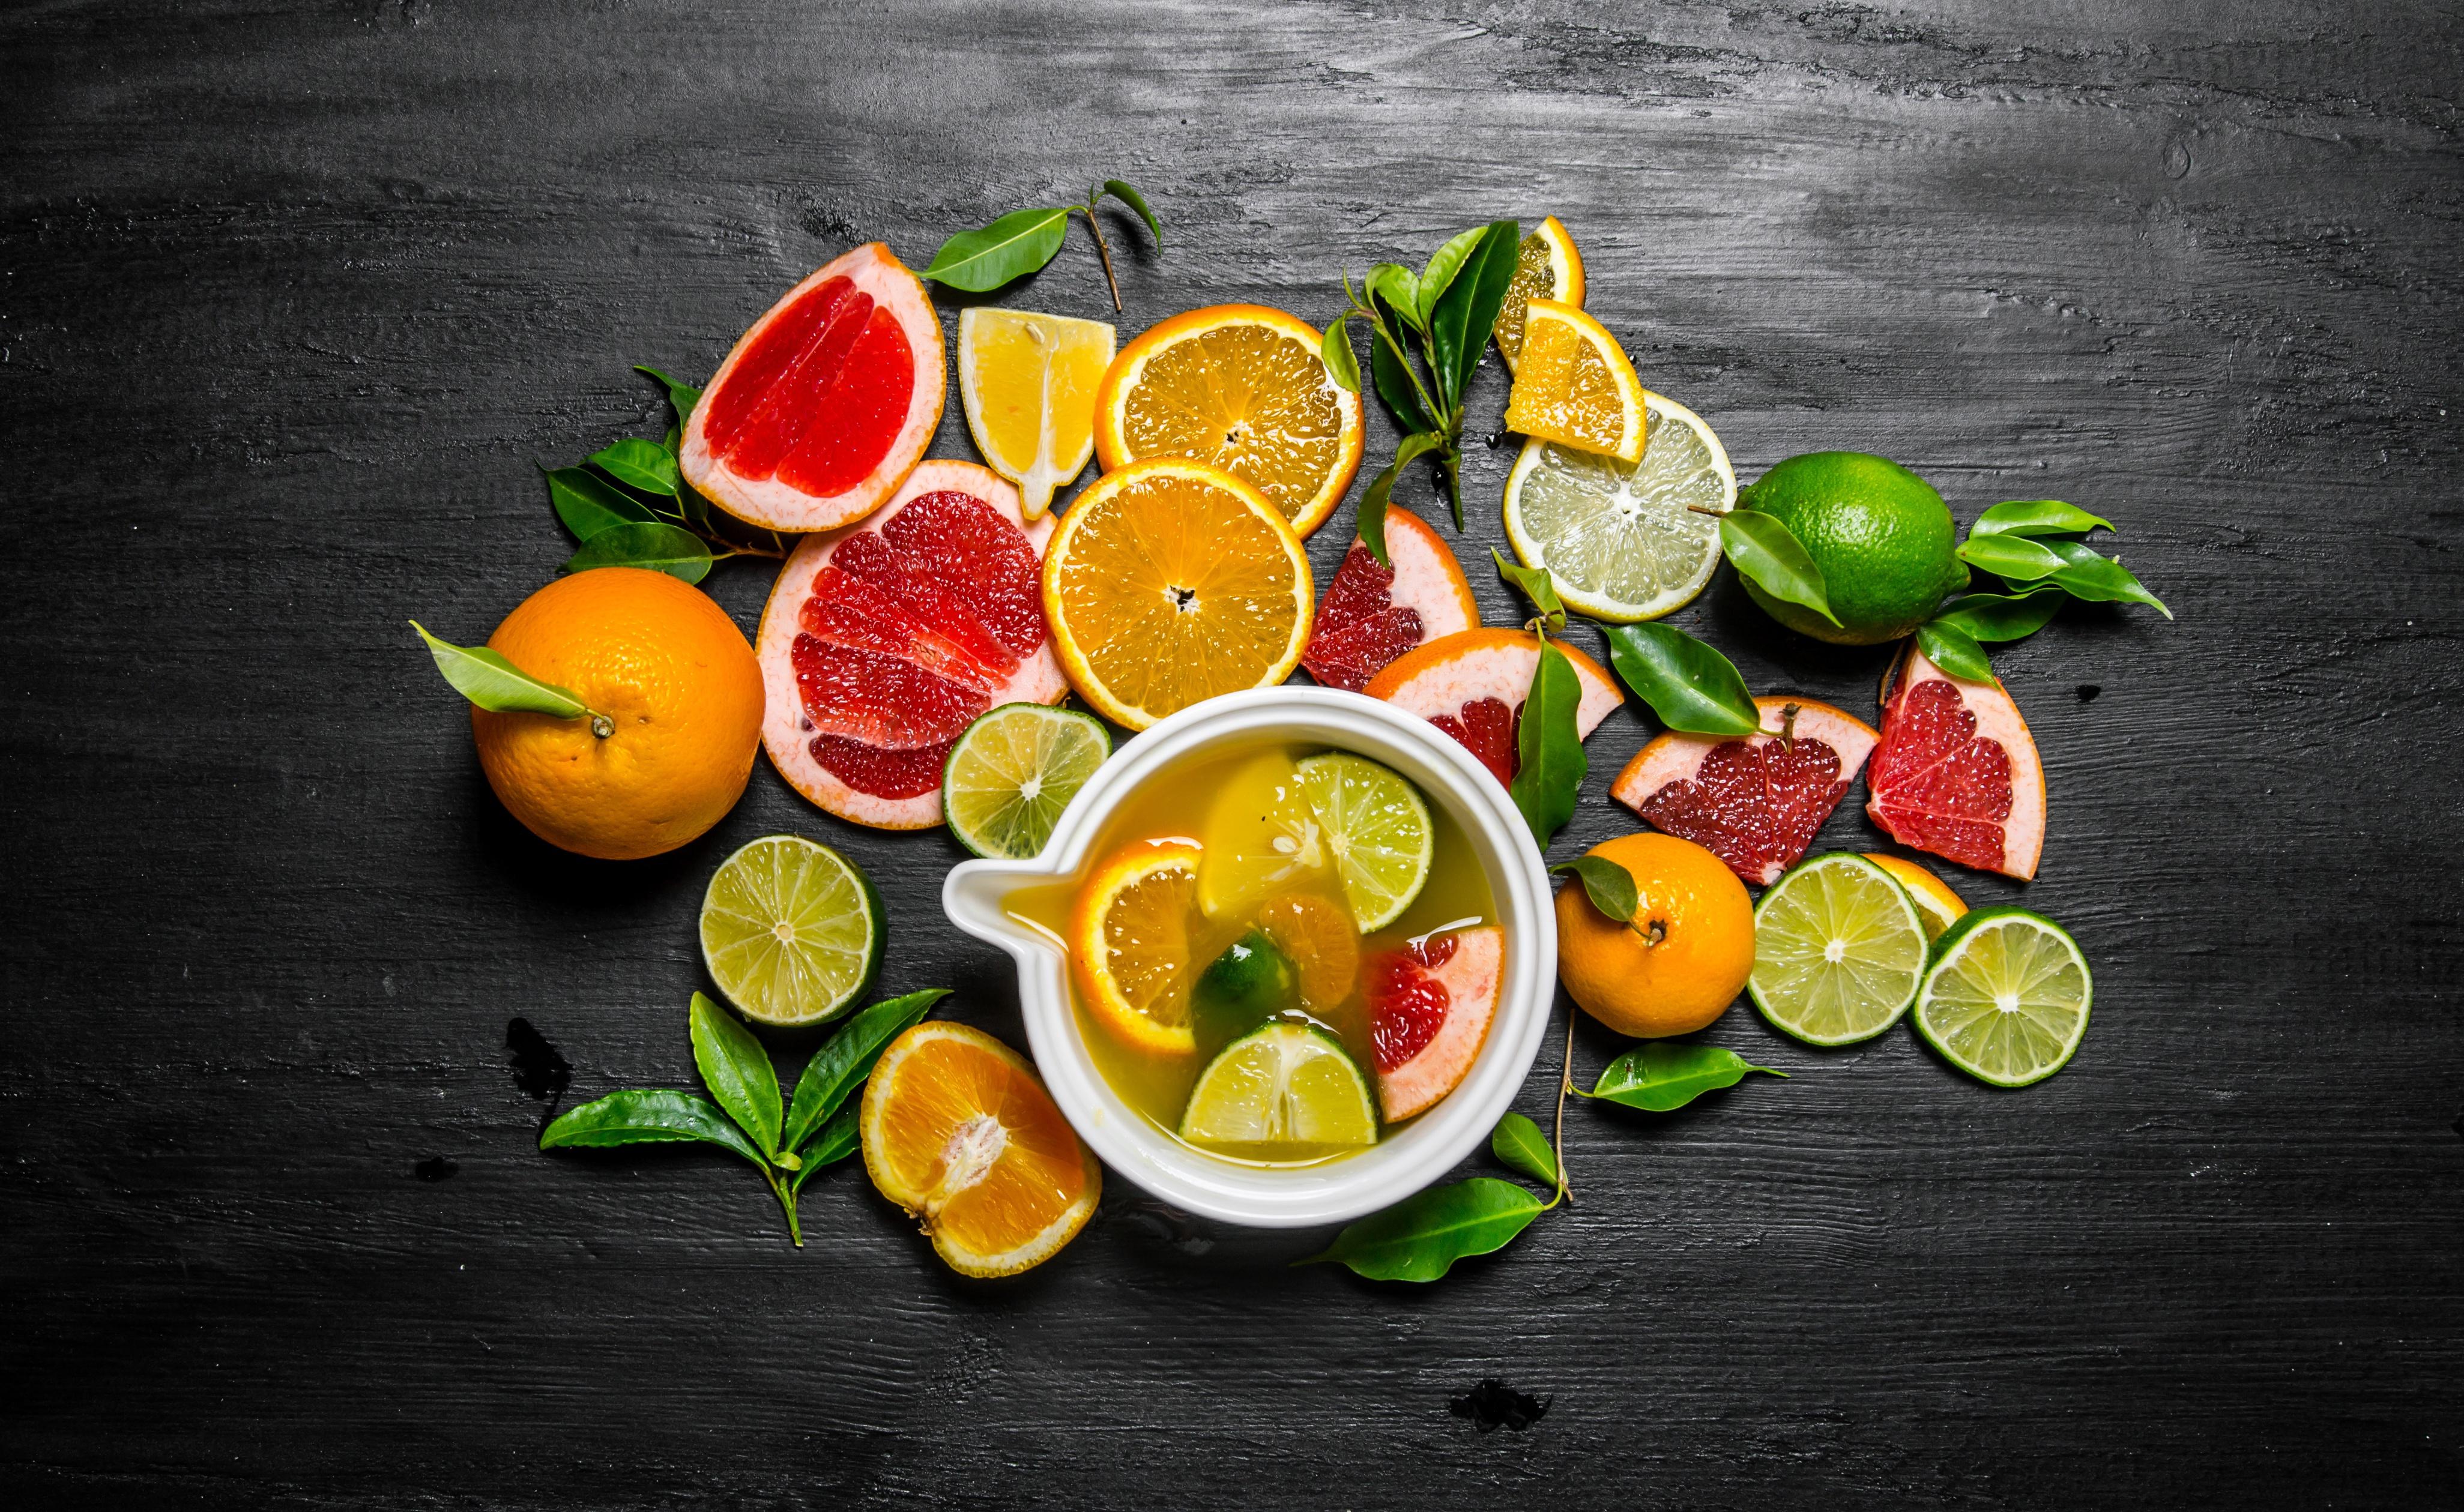 еда напитки лайм лимон апельсин клубника вишня коктейль food drinks lime lemon orange strawberry cherry cocktail  № 2154599 загрузить